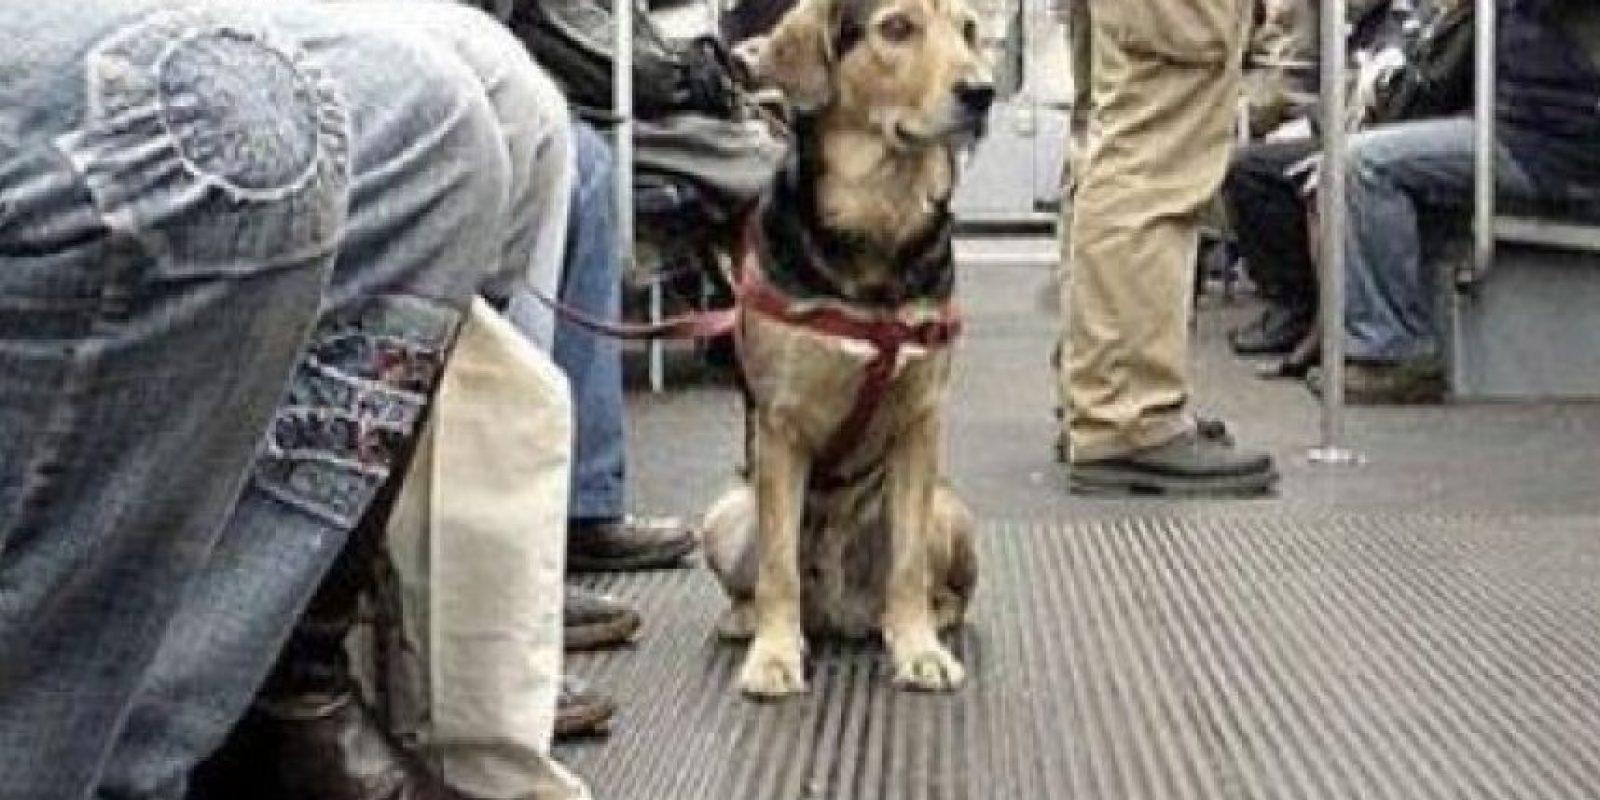 Este perrito ya está acostumbrado a viajar en metro Foto:Tumblr.com/tagged/perro/viaje